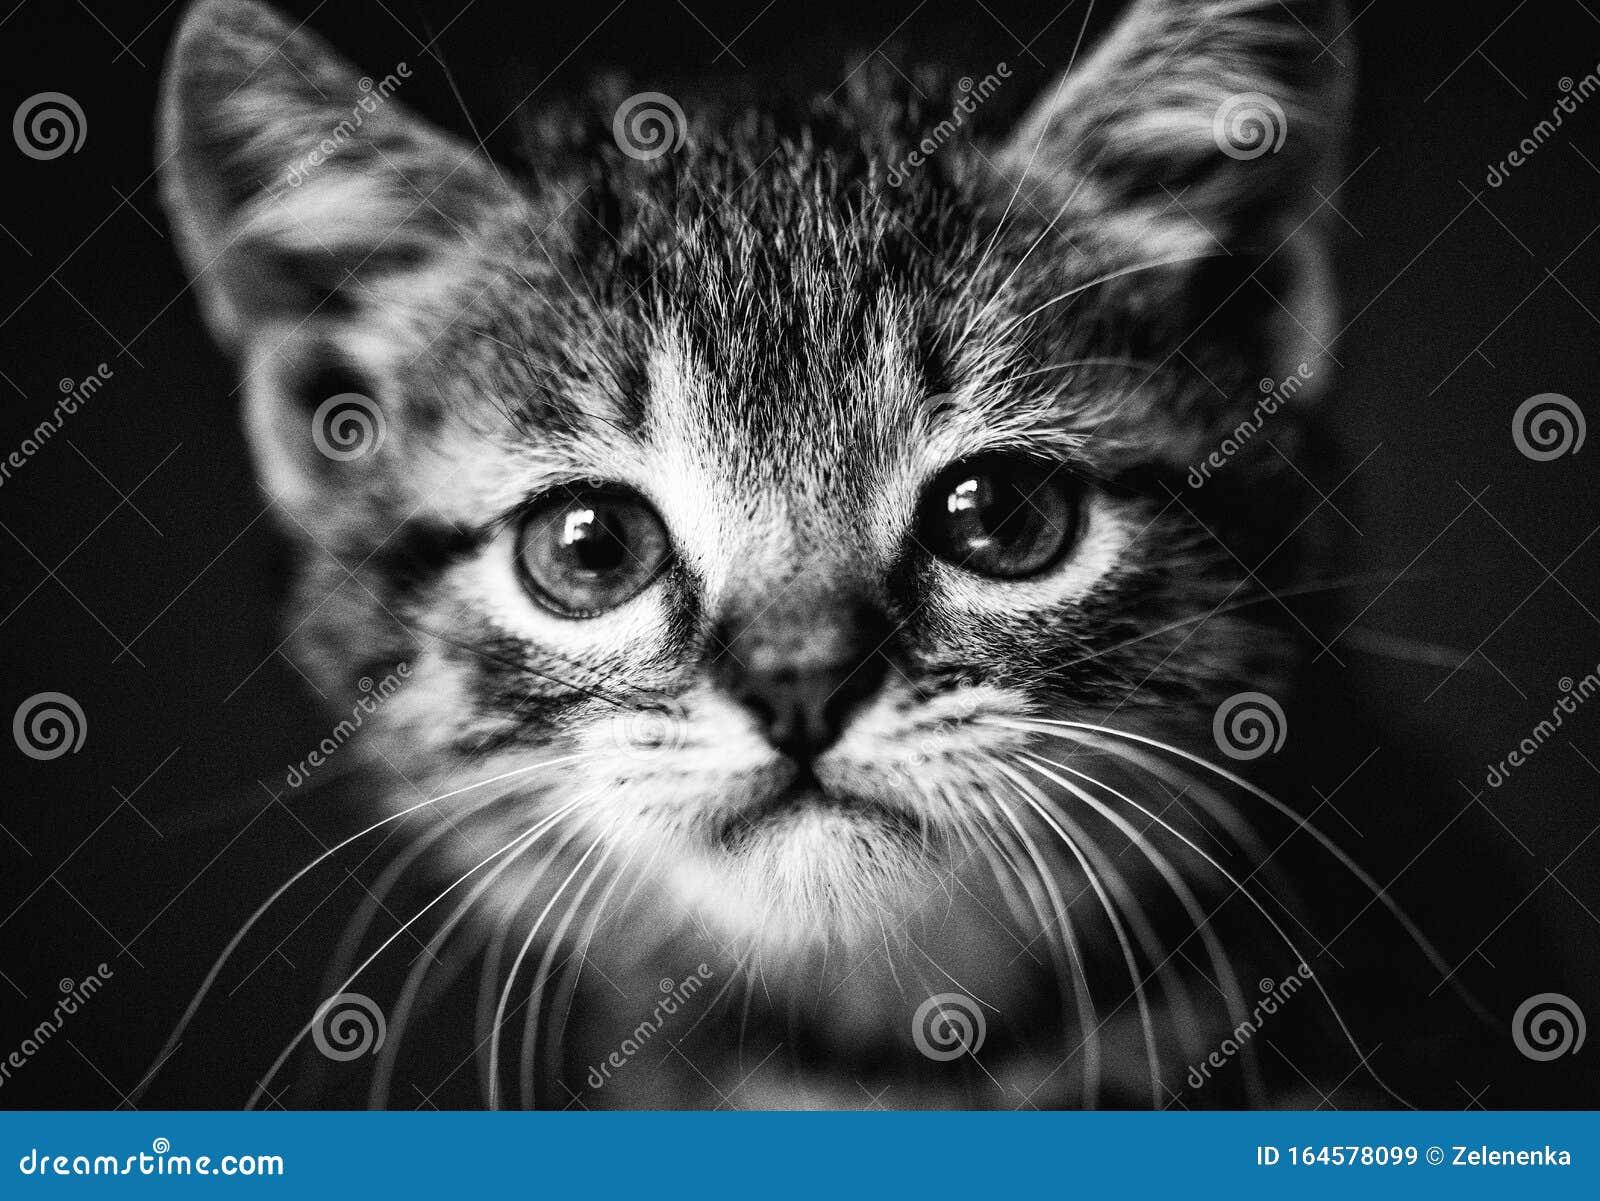 Cute Little Kitten With Amazing Eyes Sweet Baby Lovely Friend Animal World Stock Image Image Of Kitten Eyes 164578099